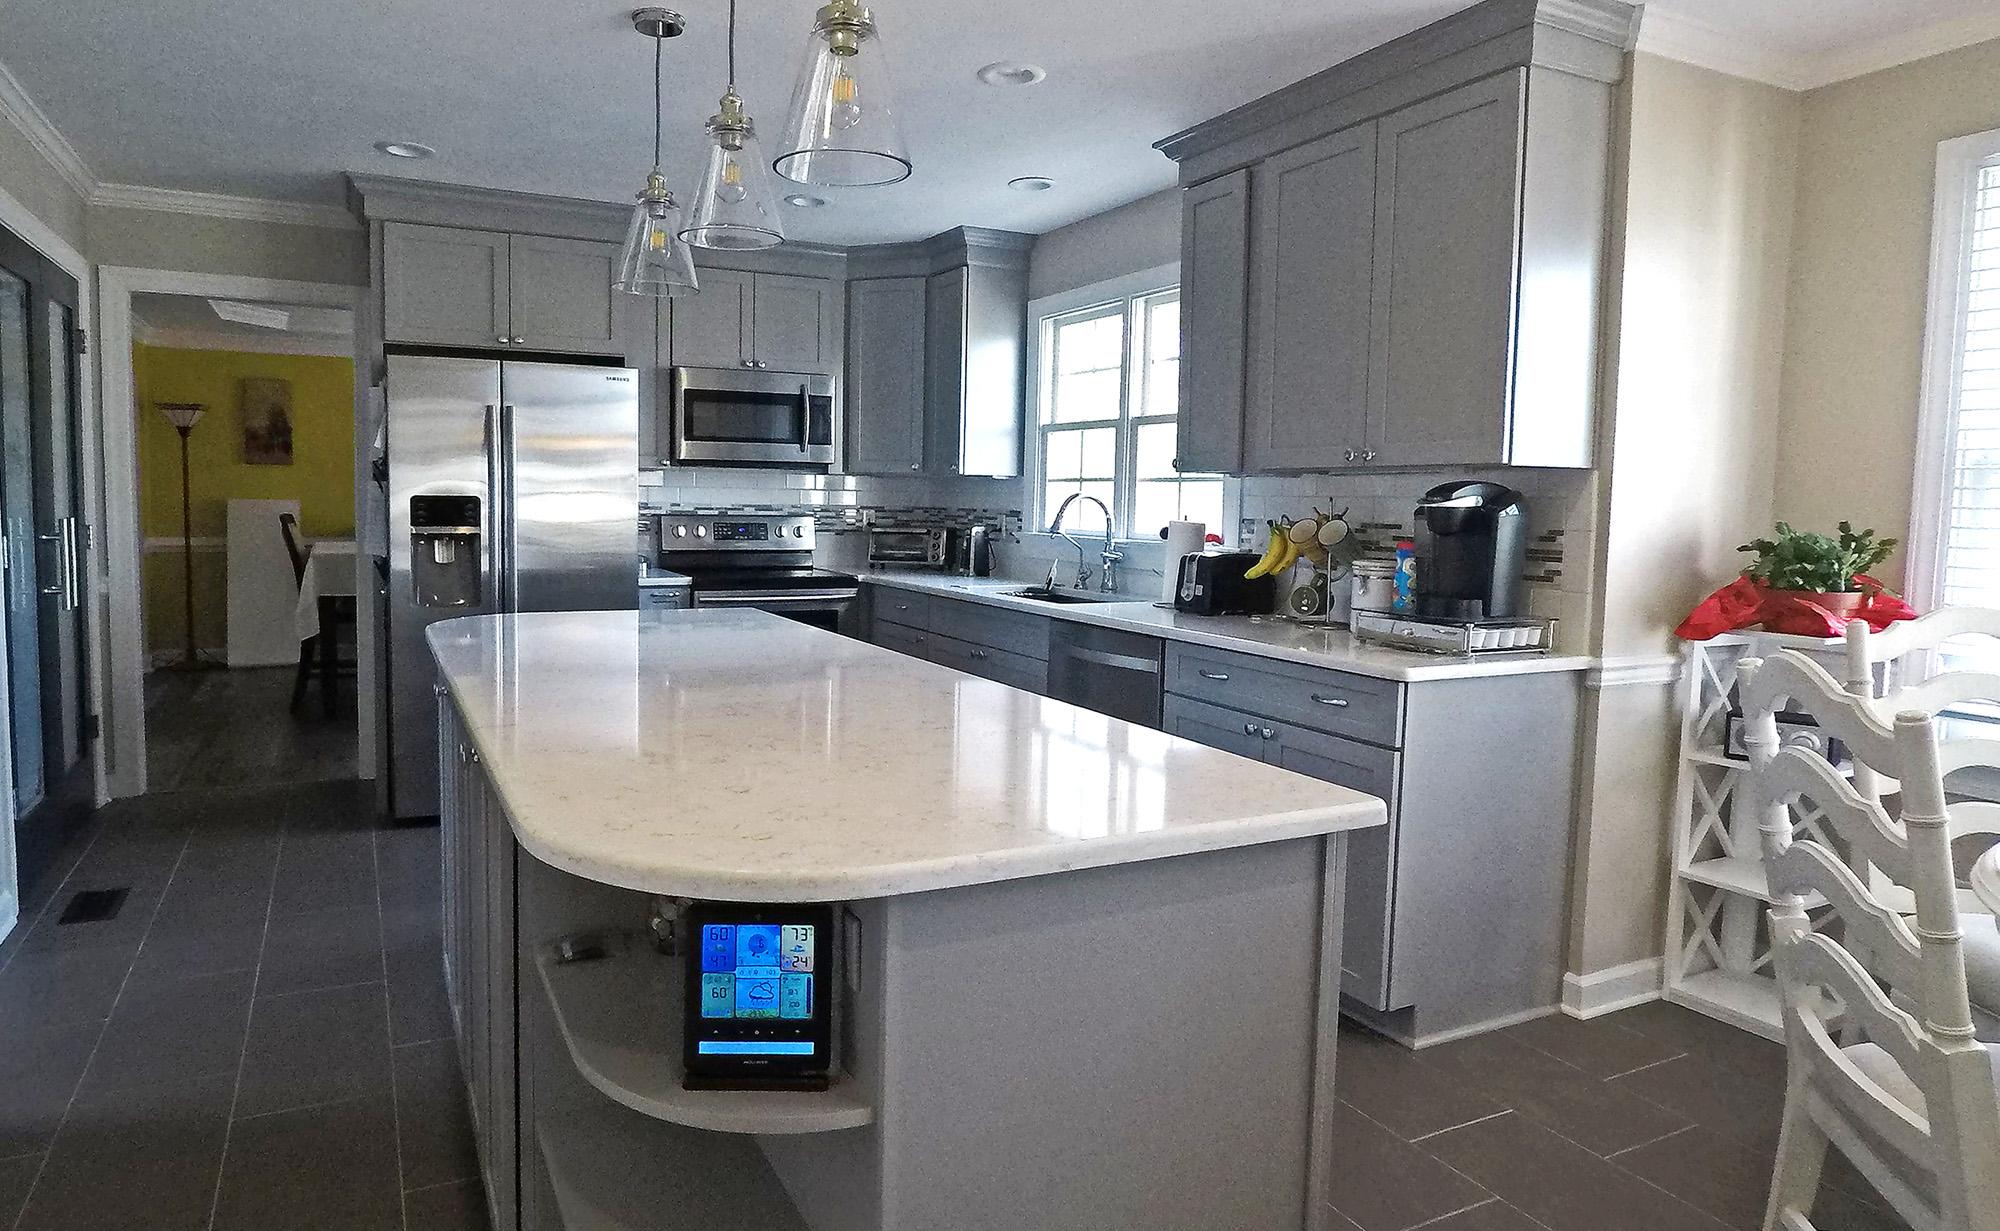 Wondrous Kitchen Remodeling South Hampton Roads Jerry Harris Home Interior And Landscaping Palasignezvosmurscom